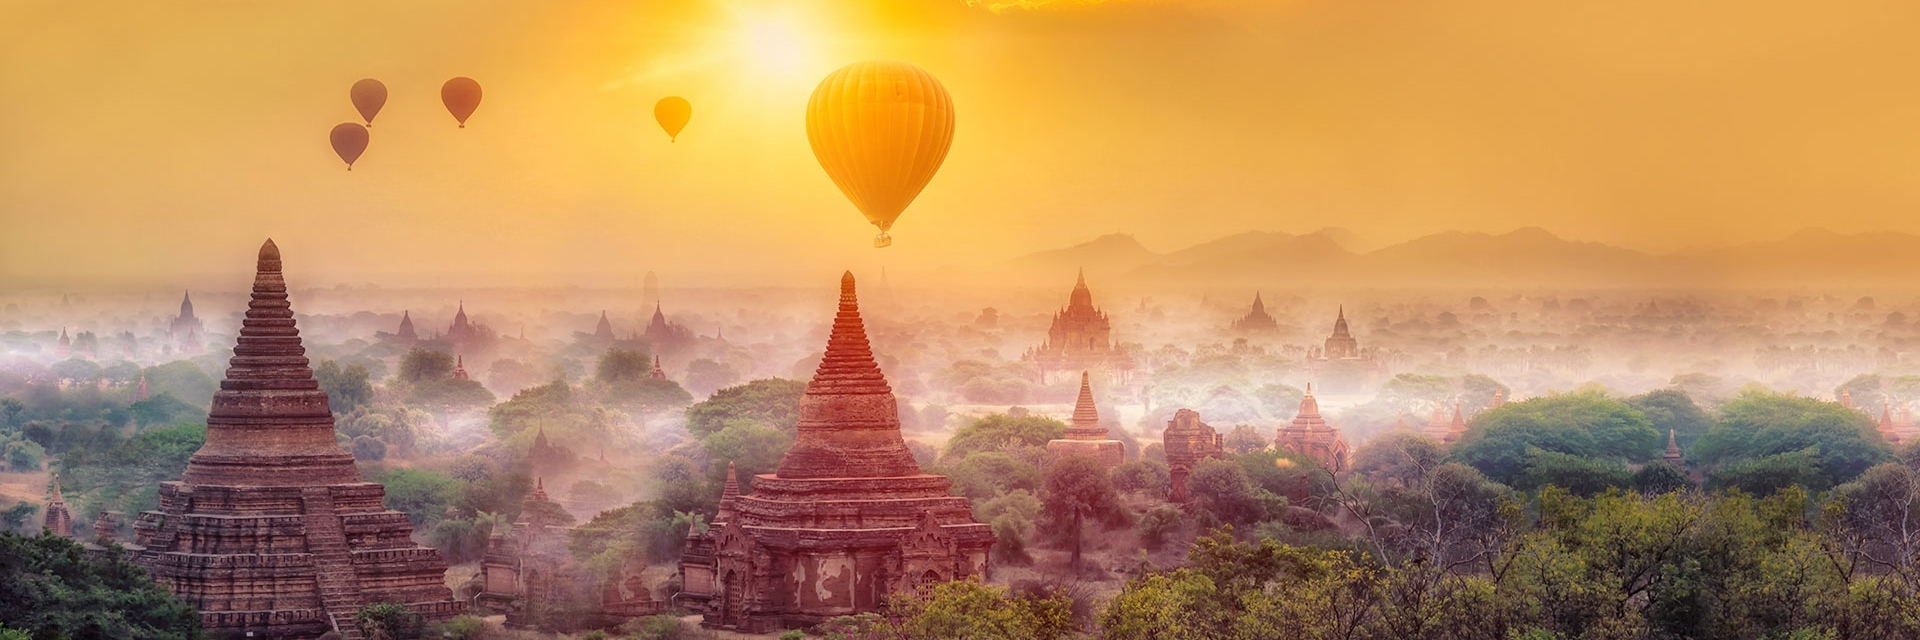 https://gody.vn/blog/daisy6302/post/co-nen-du-lich-myanmar-trong-thang-8-visa-ve-may-bay-an-gi-choi-dau-4349